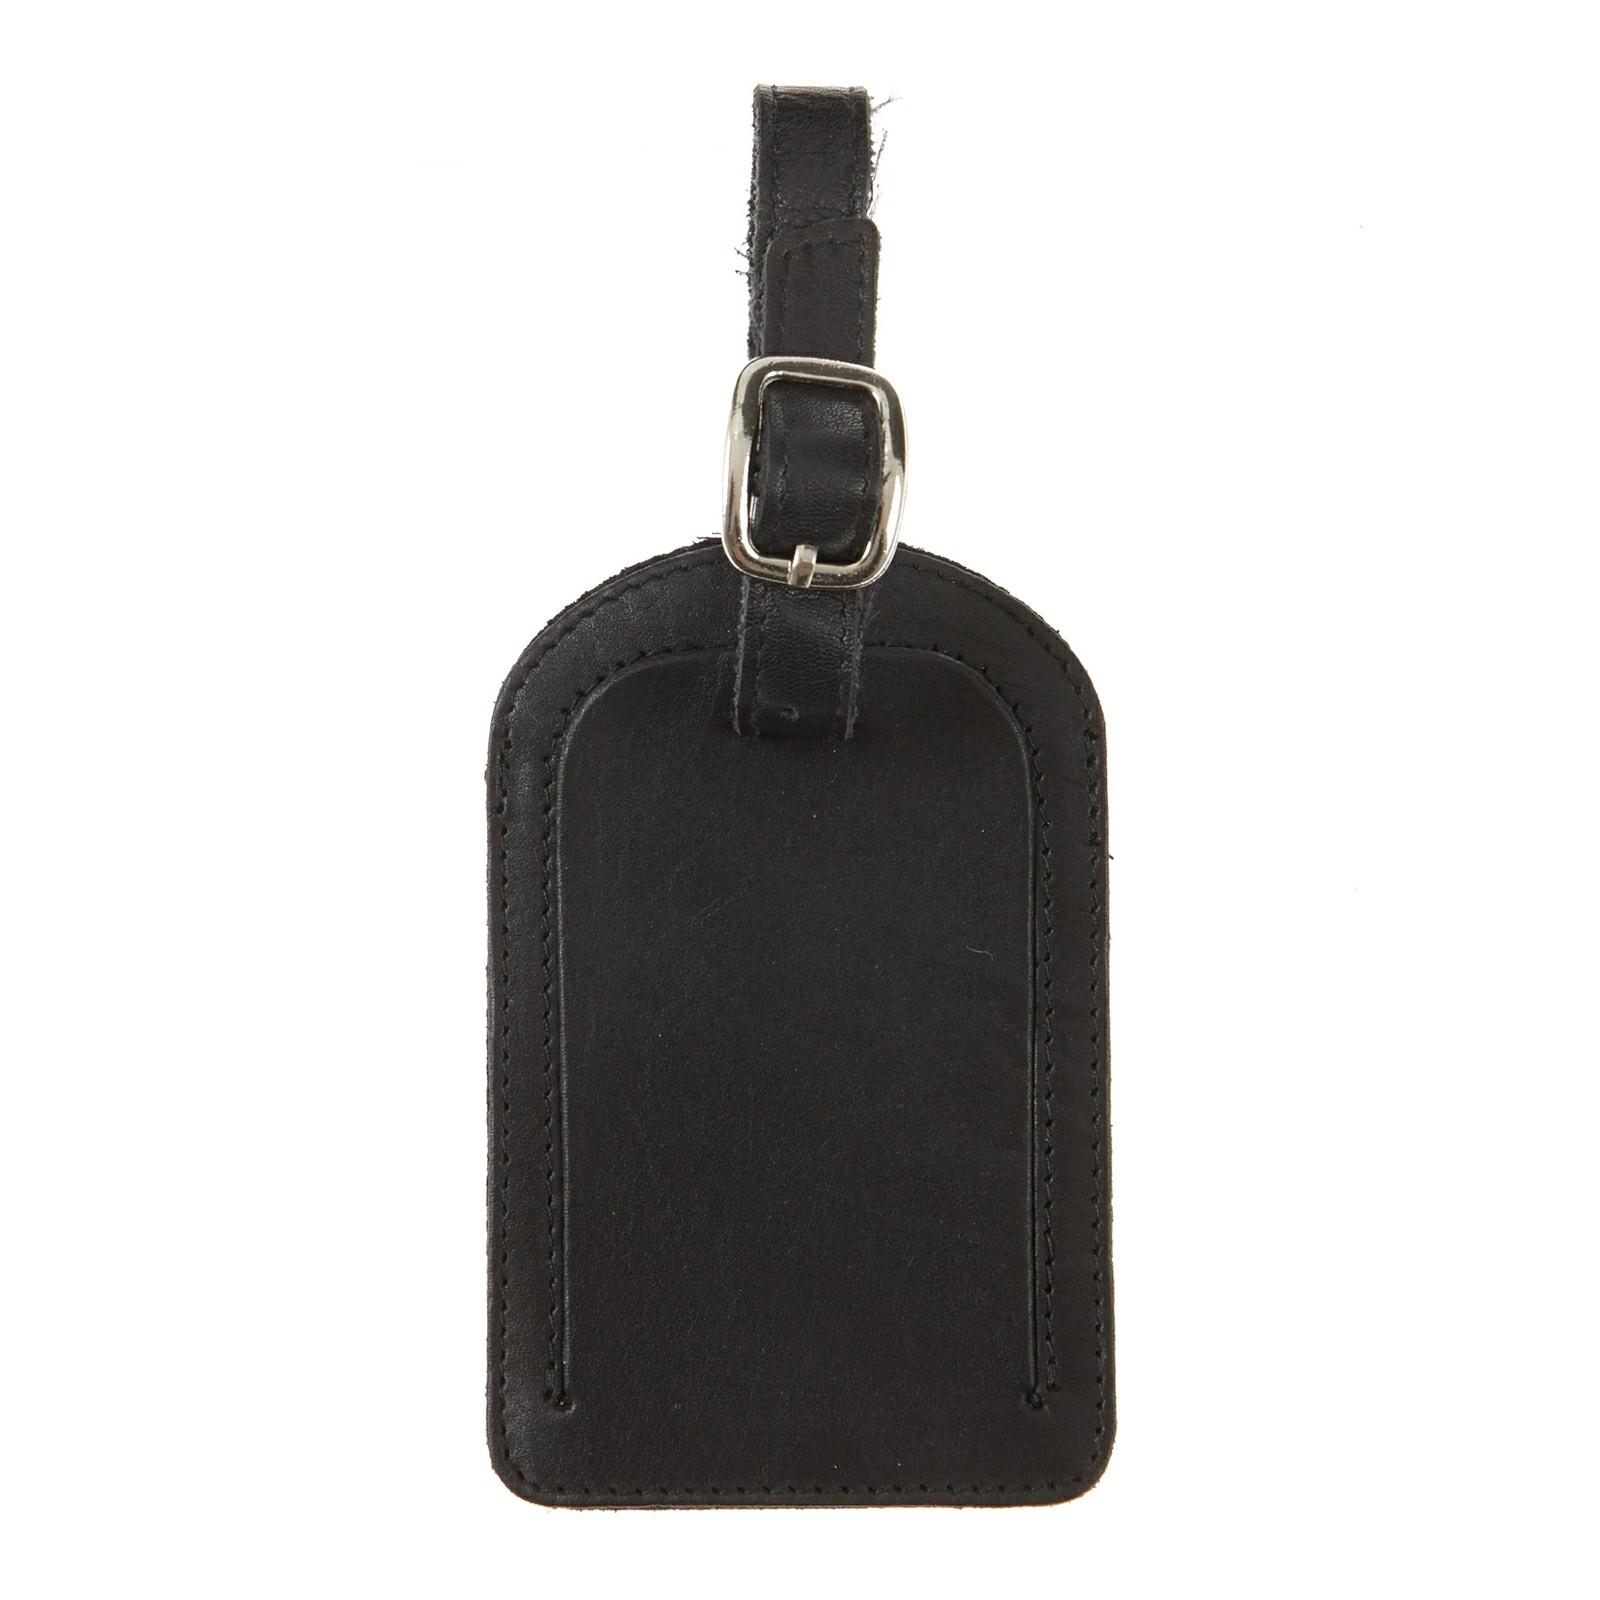 Cazzac kuffertmærke i skind